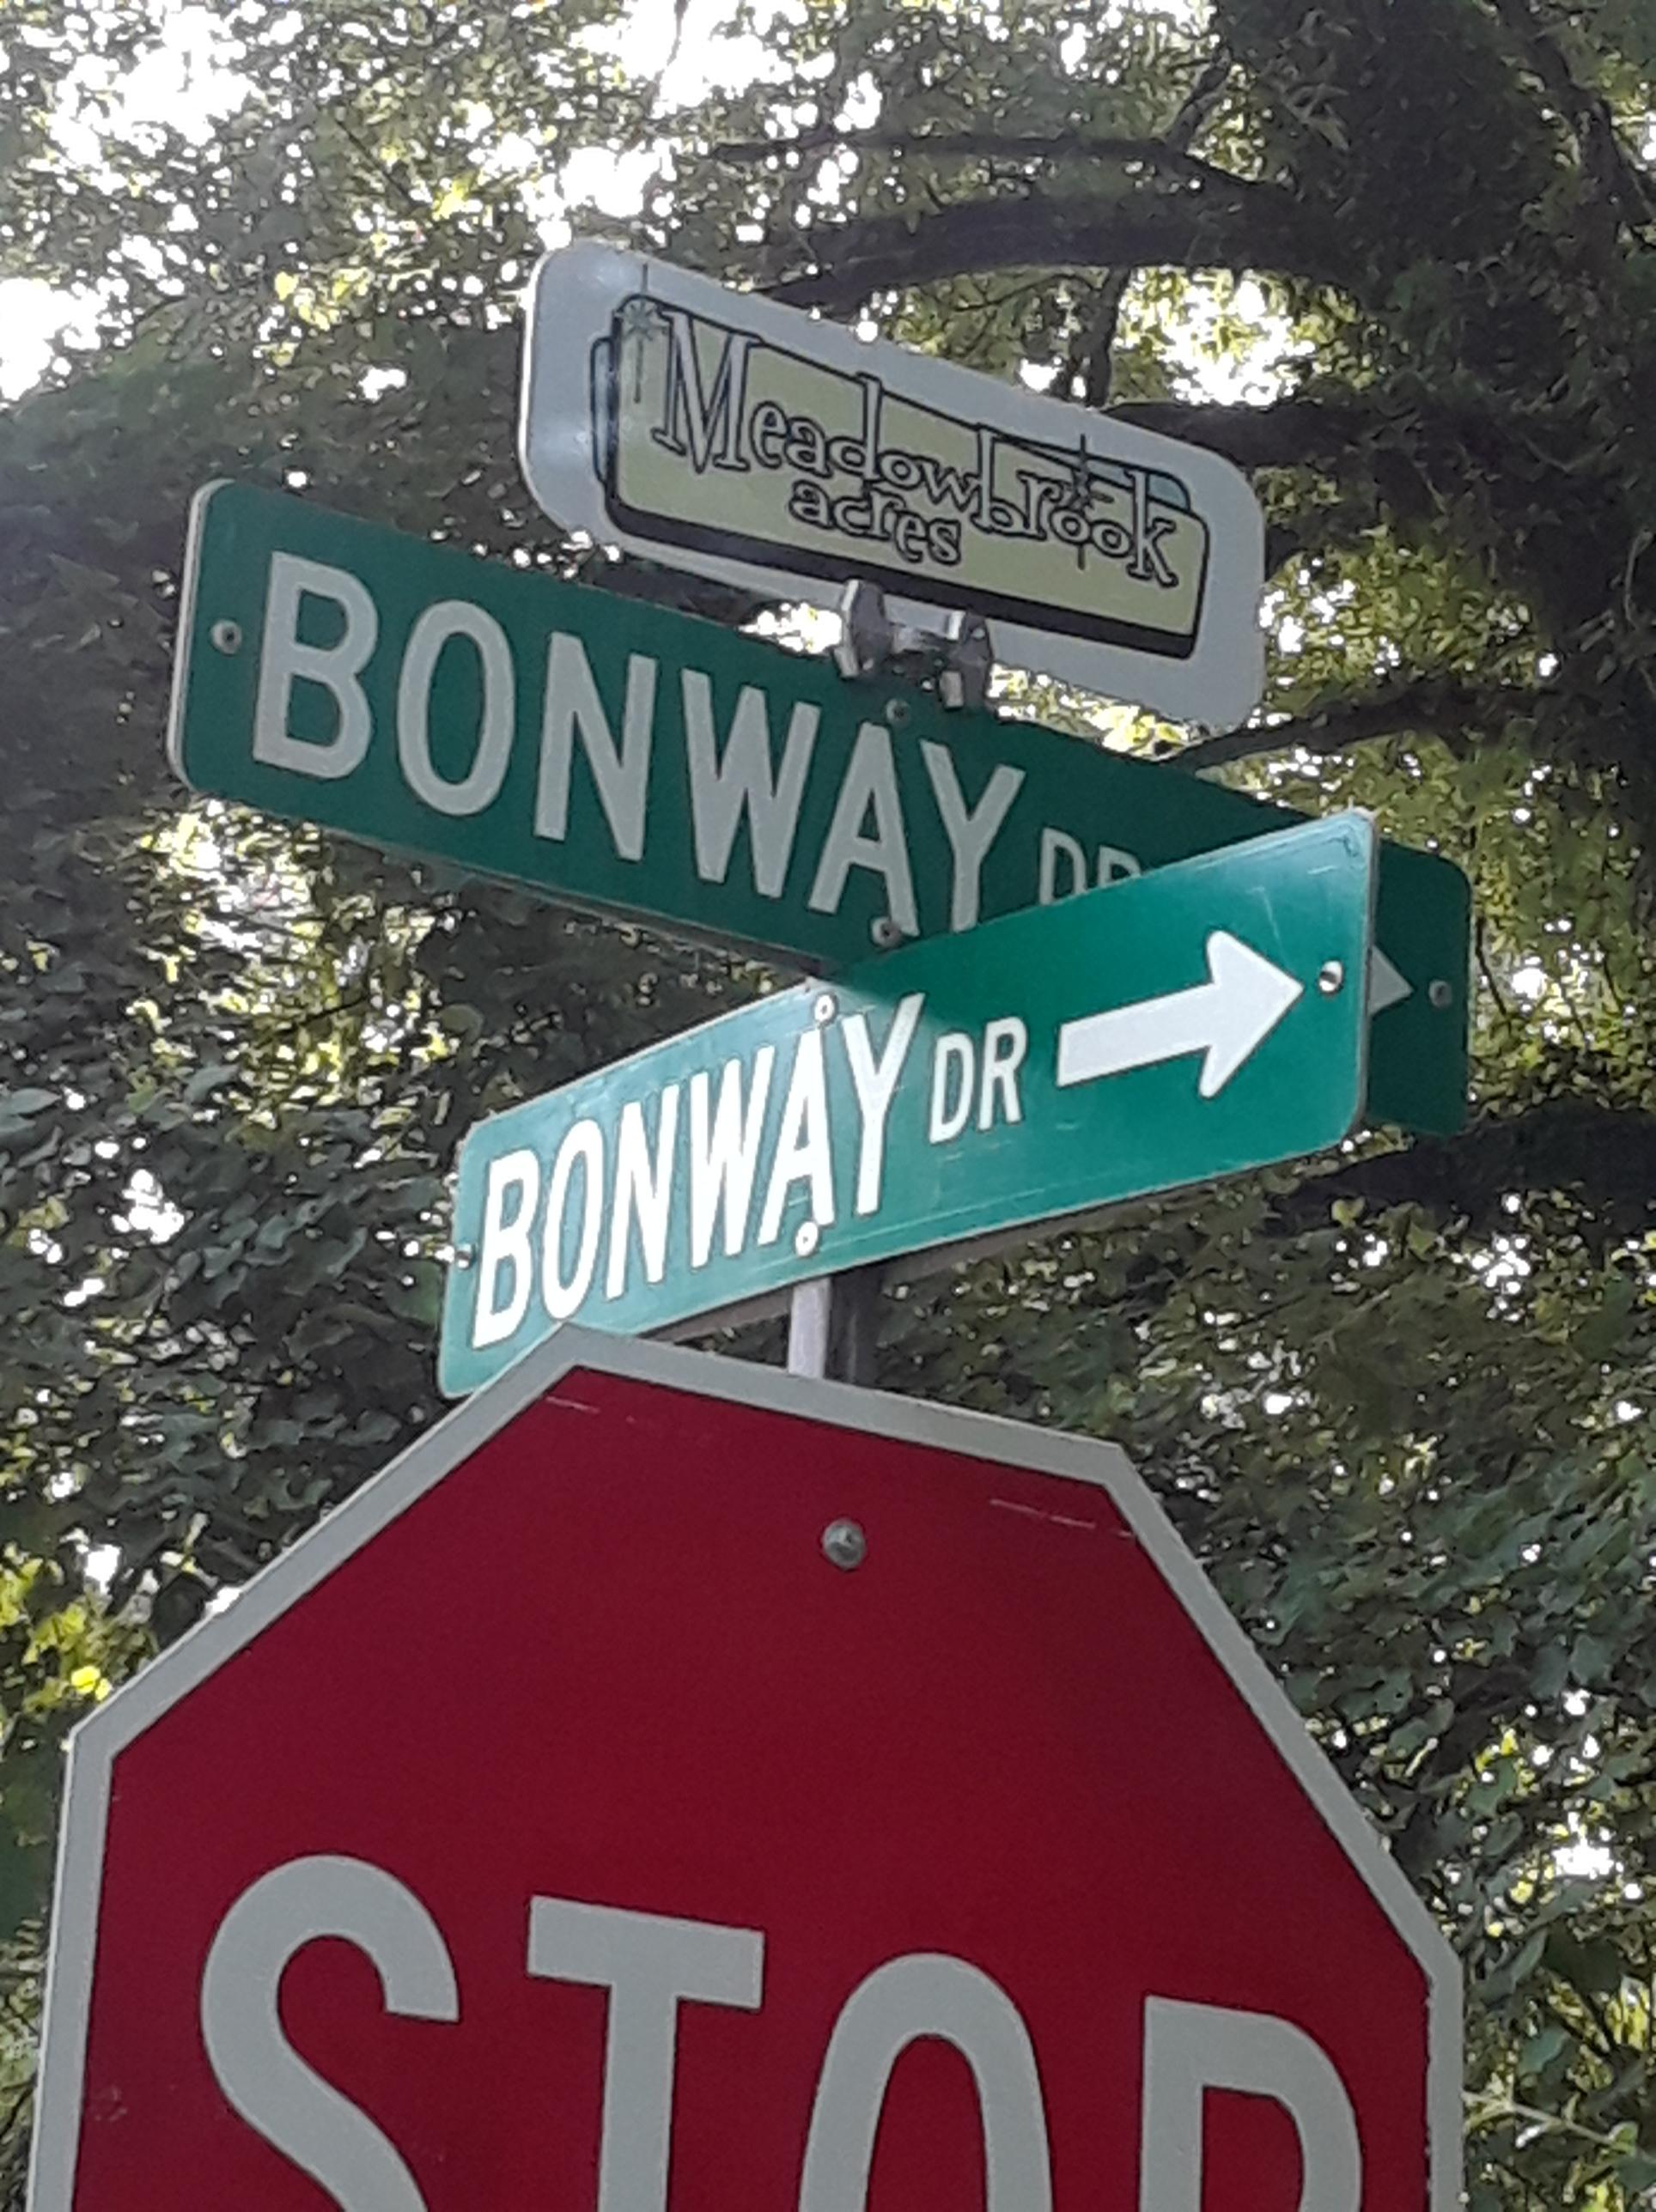 Decatur Neighborhood Meadowbrook Acres Street Sign Toppers